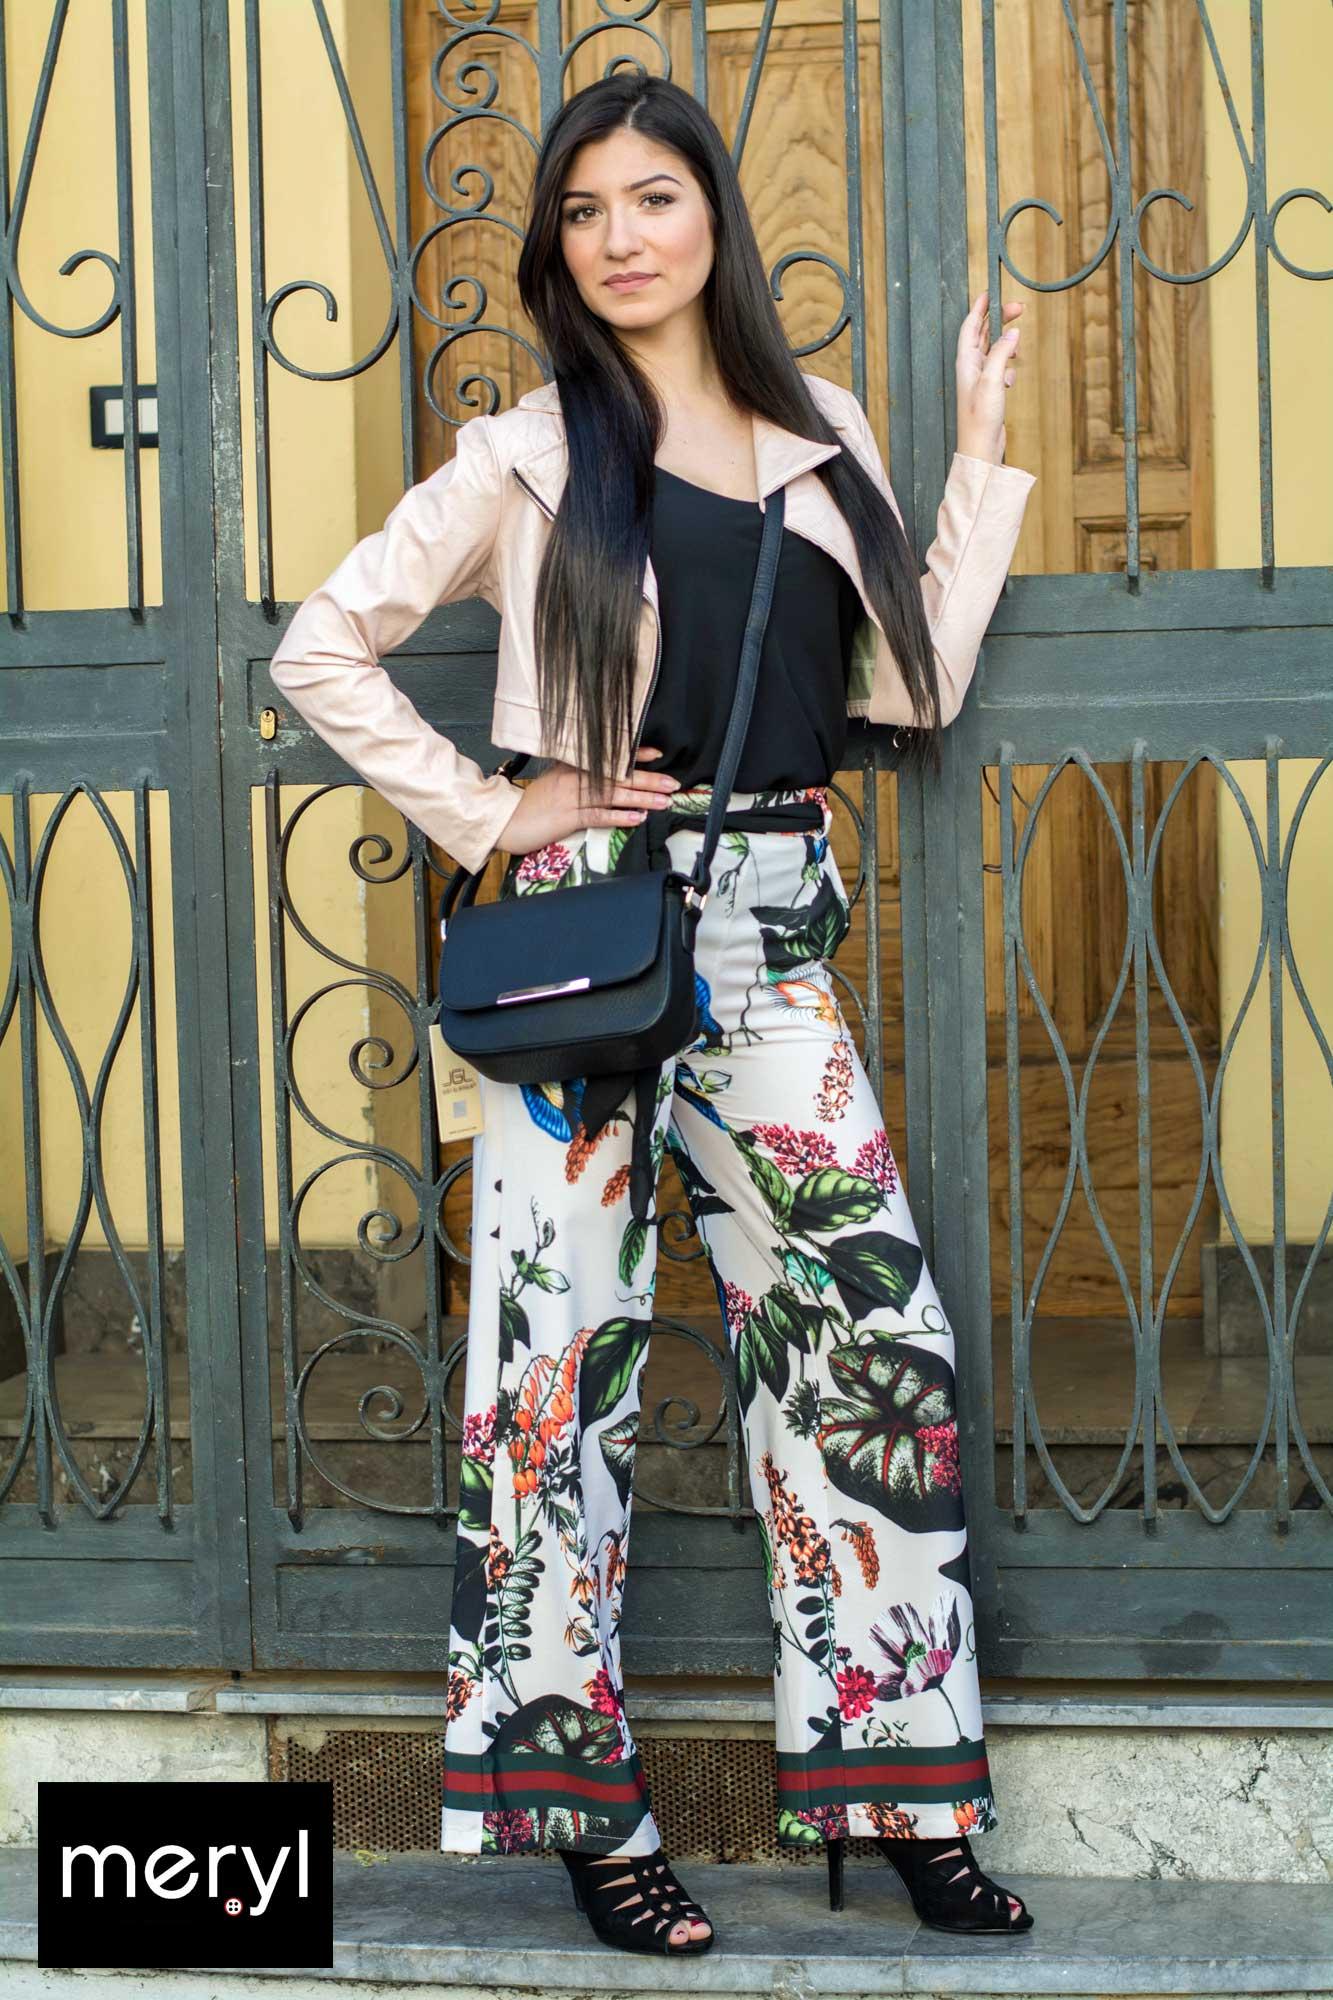 Pantalone palazzo con giacchino jeans e maglia smanicata.Borsa Meryl.